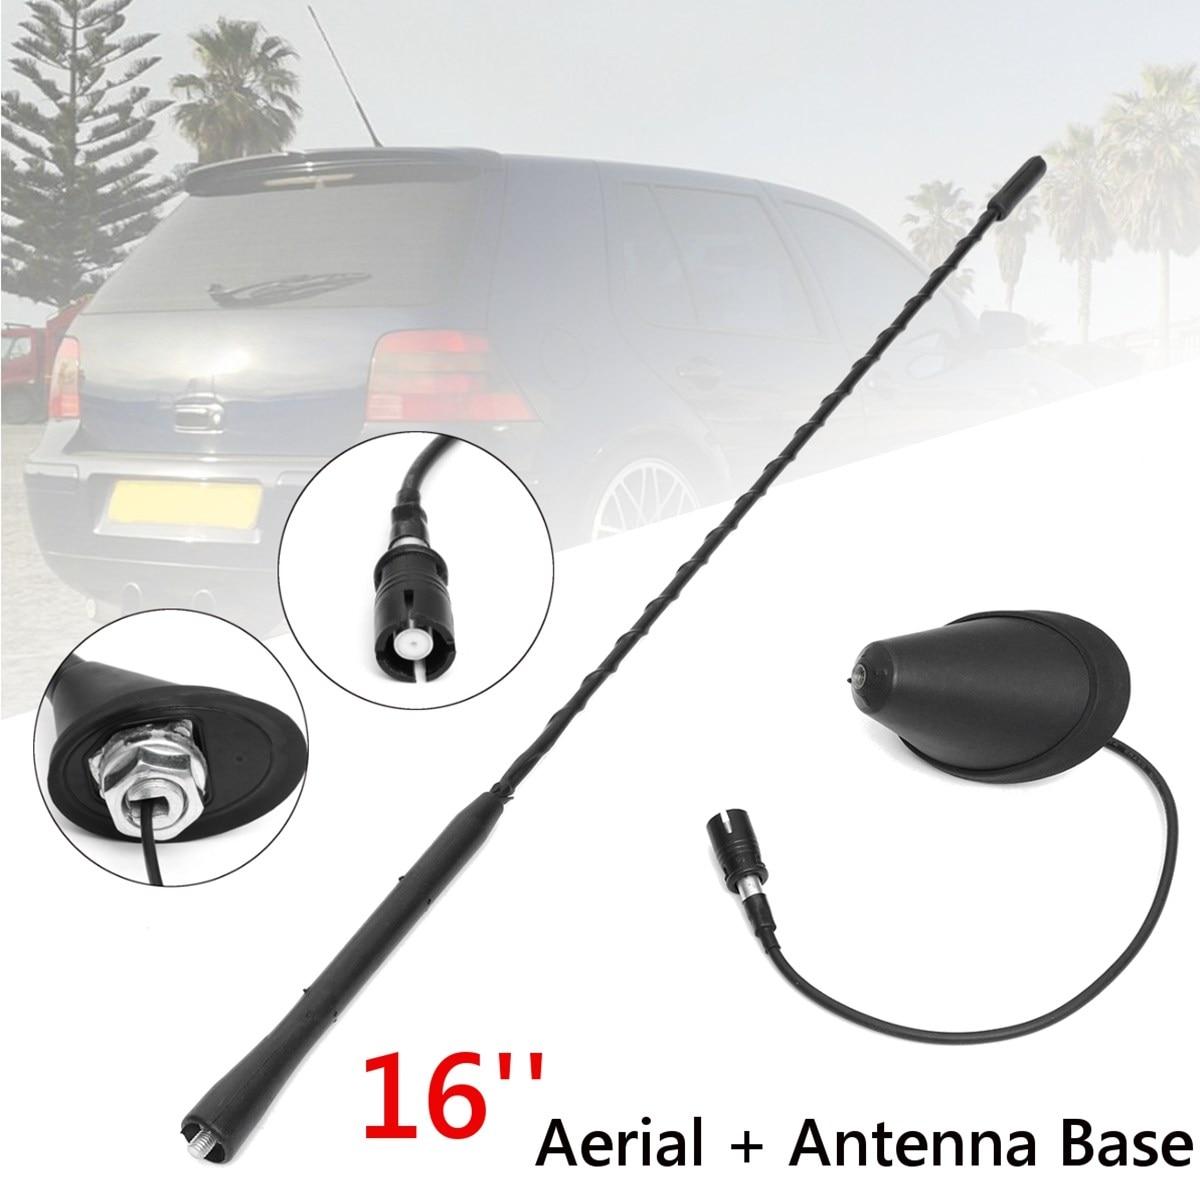 16 pouce Universal AM/FM Antenne Antenne Toit Mât Base Pour VW/Volkswagen/Skoda/Audi/ golf/Passat/Jetta/Bora MK4 1997 1998 1999